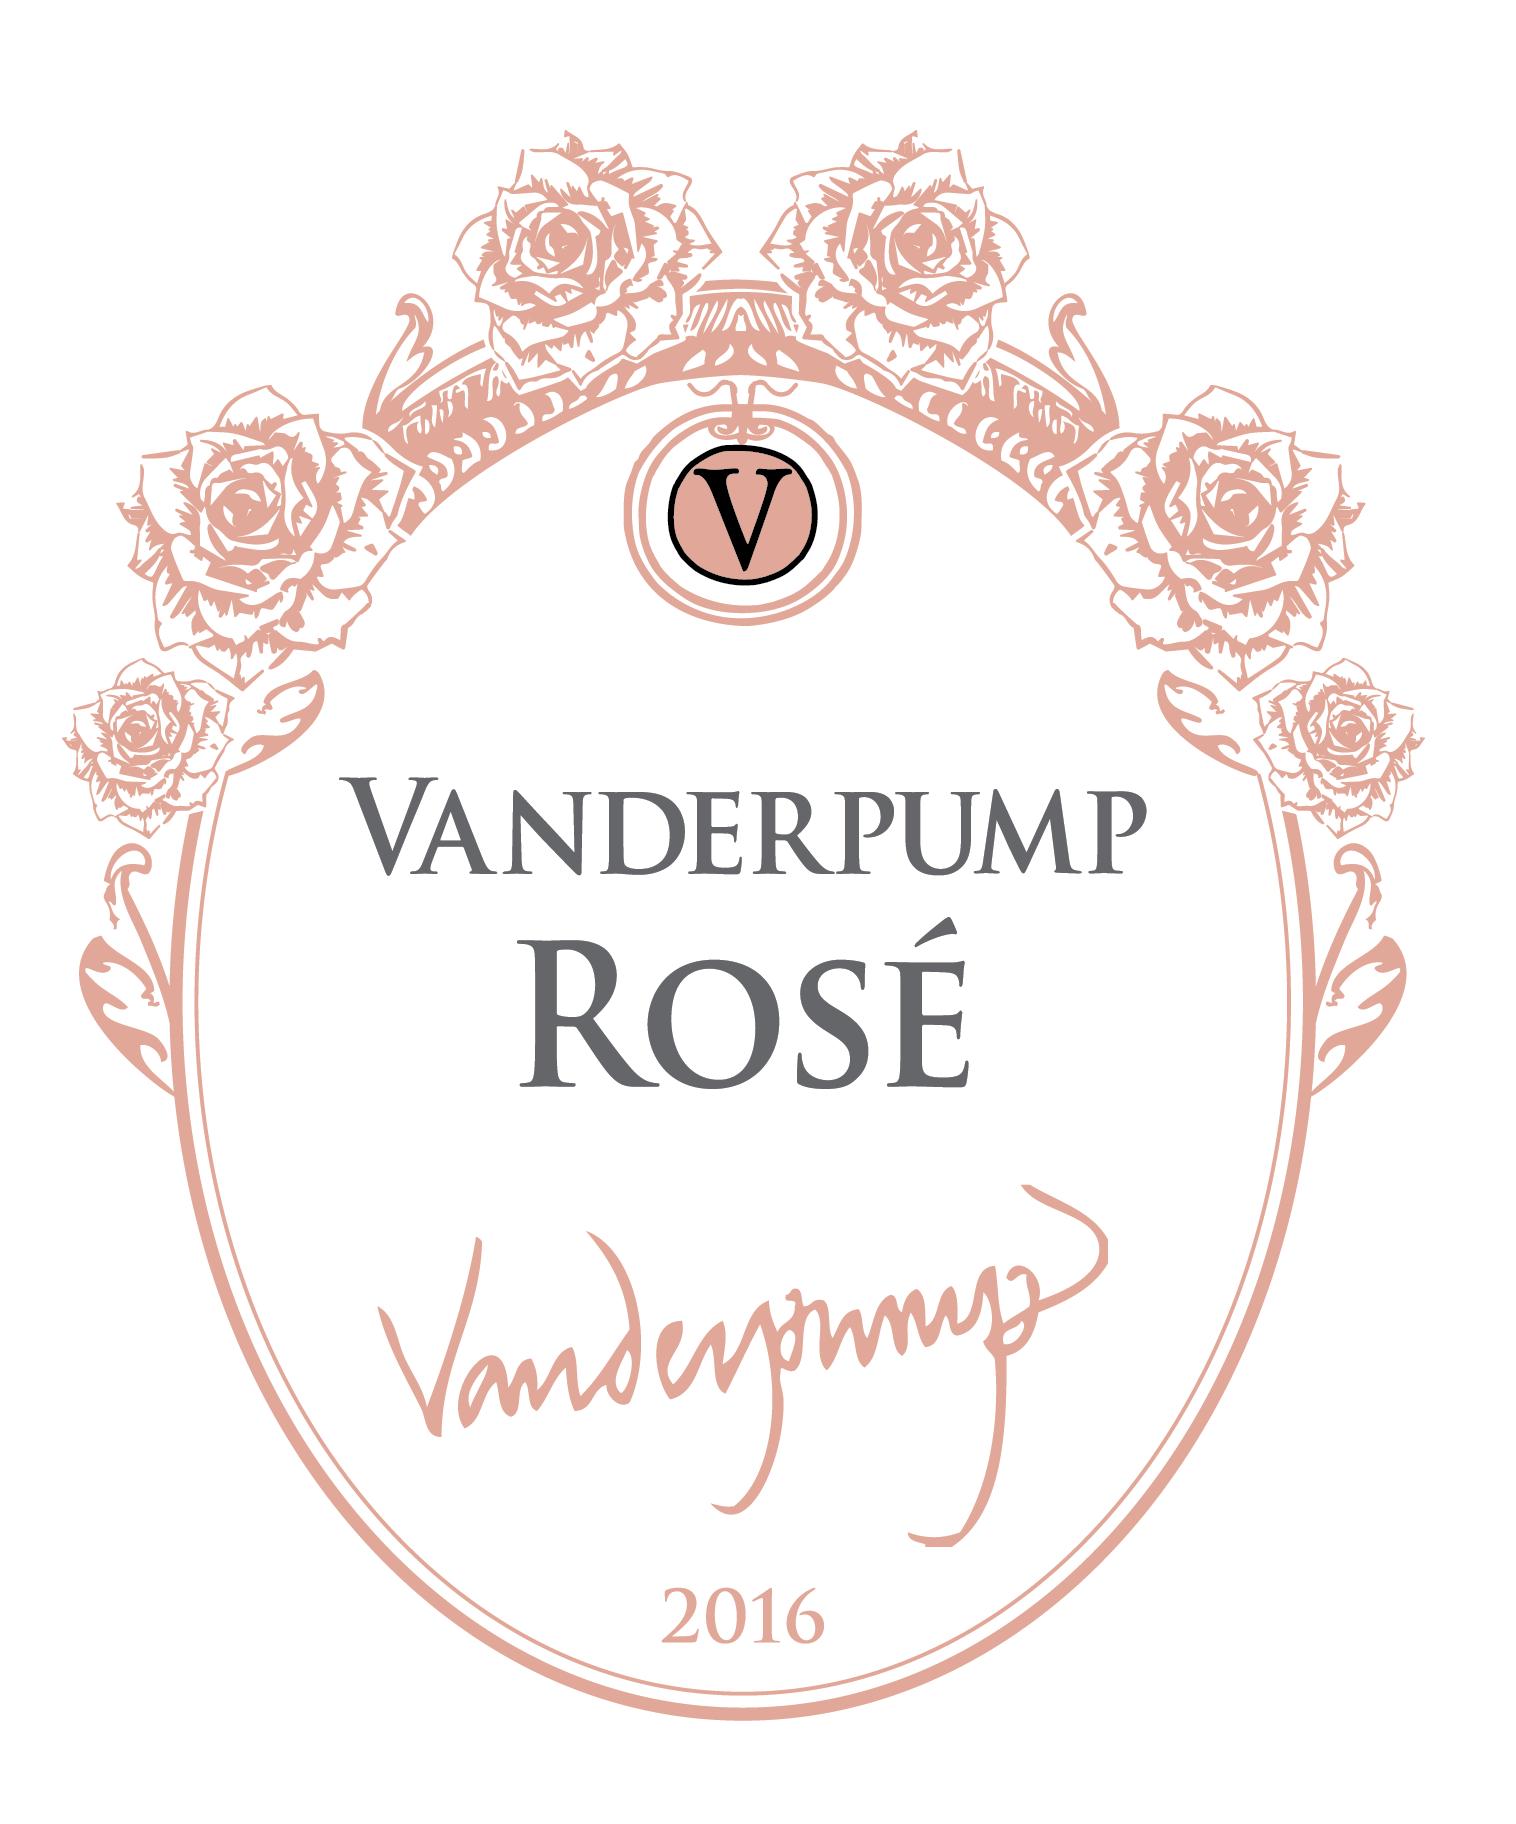 Vanderpump Rose Logo.png